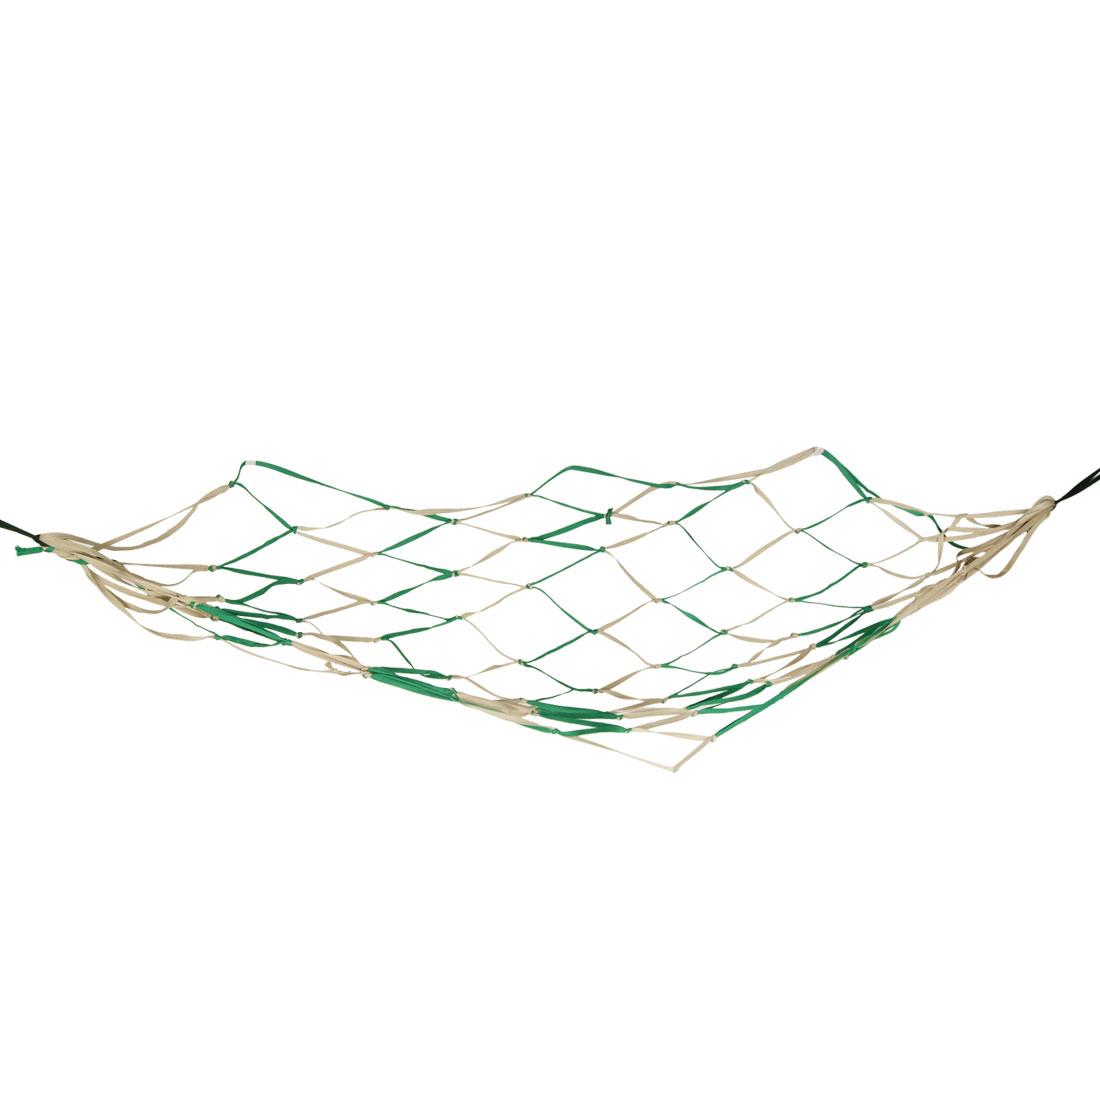 "79"" x 43"" Khaki Green Nylon Hammock Mesh Net Sleeping Bed for Traveling Camping"